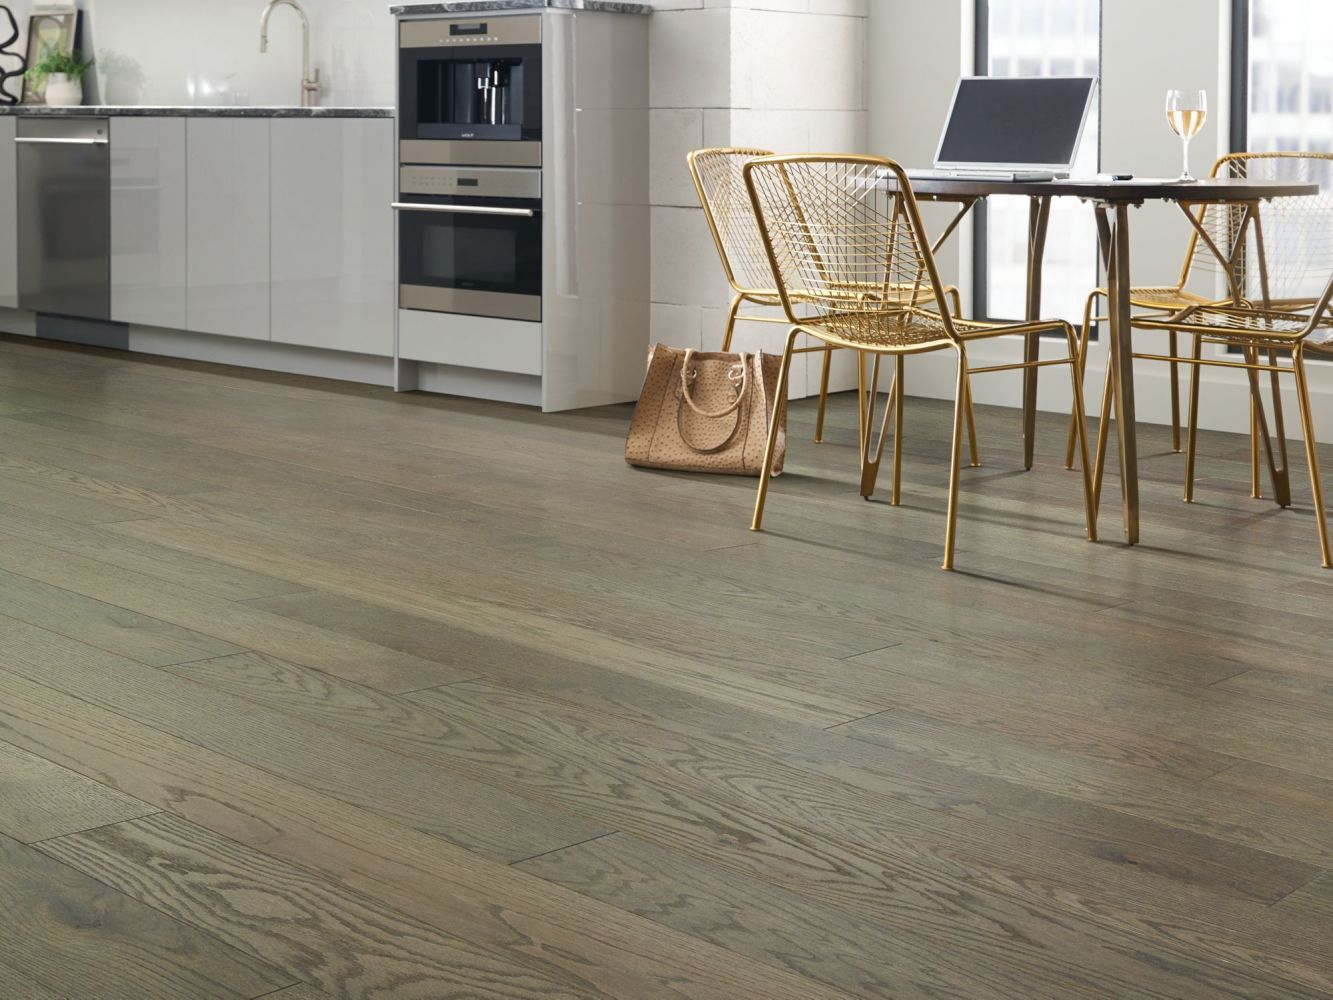 Shaw Floors Home Fn Gold Hardwood Oasis Oak Hearth 05093_HW714